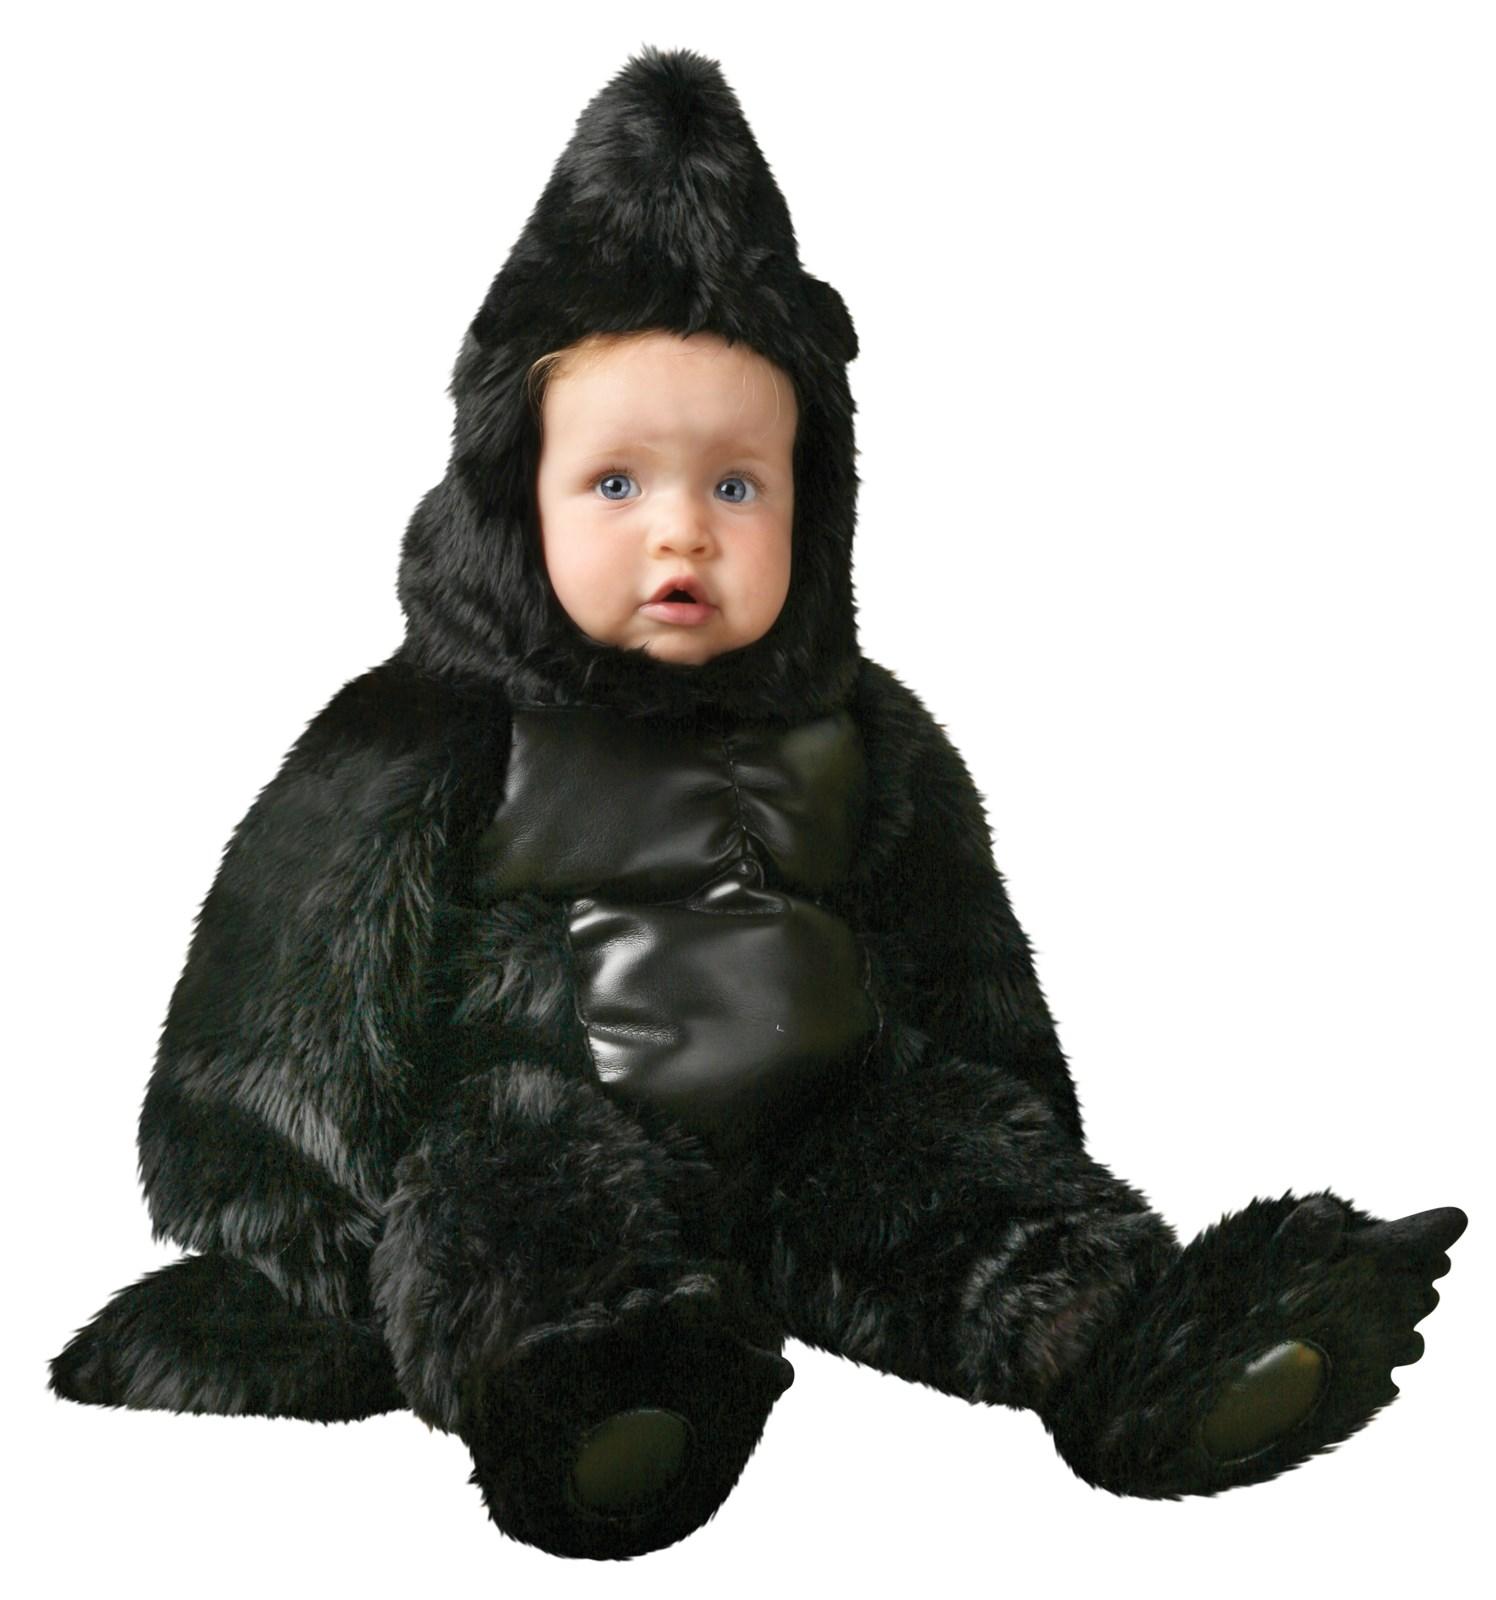 Gorilla Deluxe Toddler Costume | BuyCostumes.com